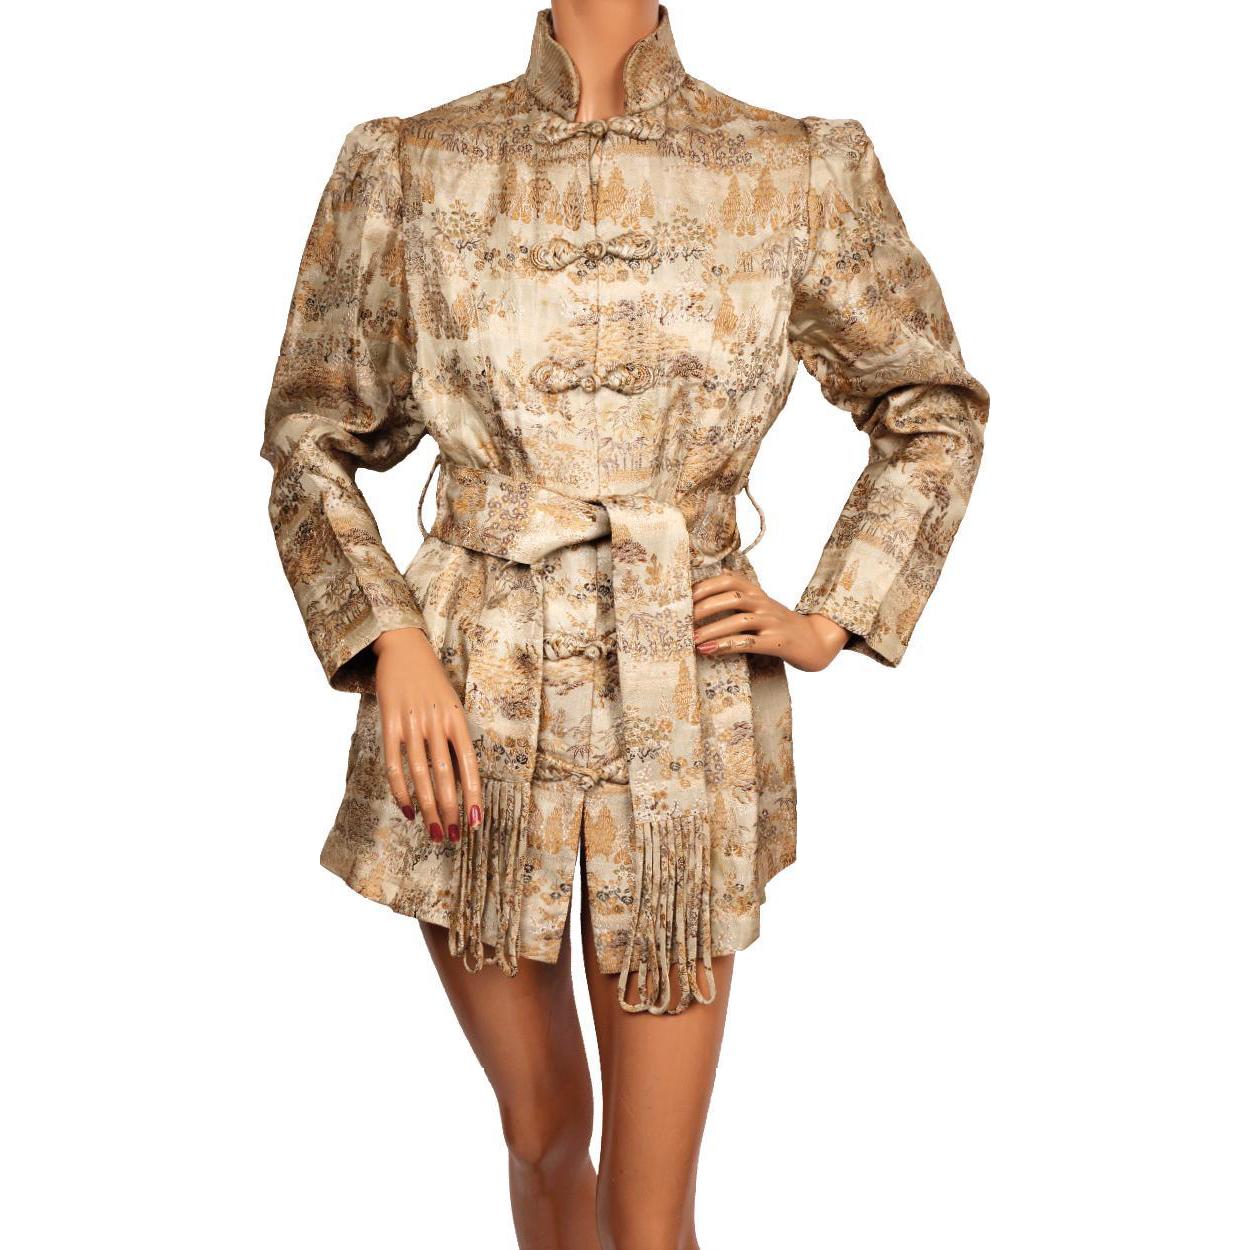 RESERVED Vintage 1940s Chinese Jacket Woven Silk Brocade Pattern - Medium